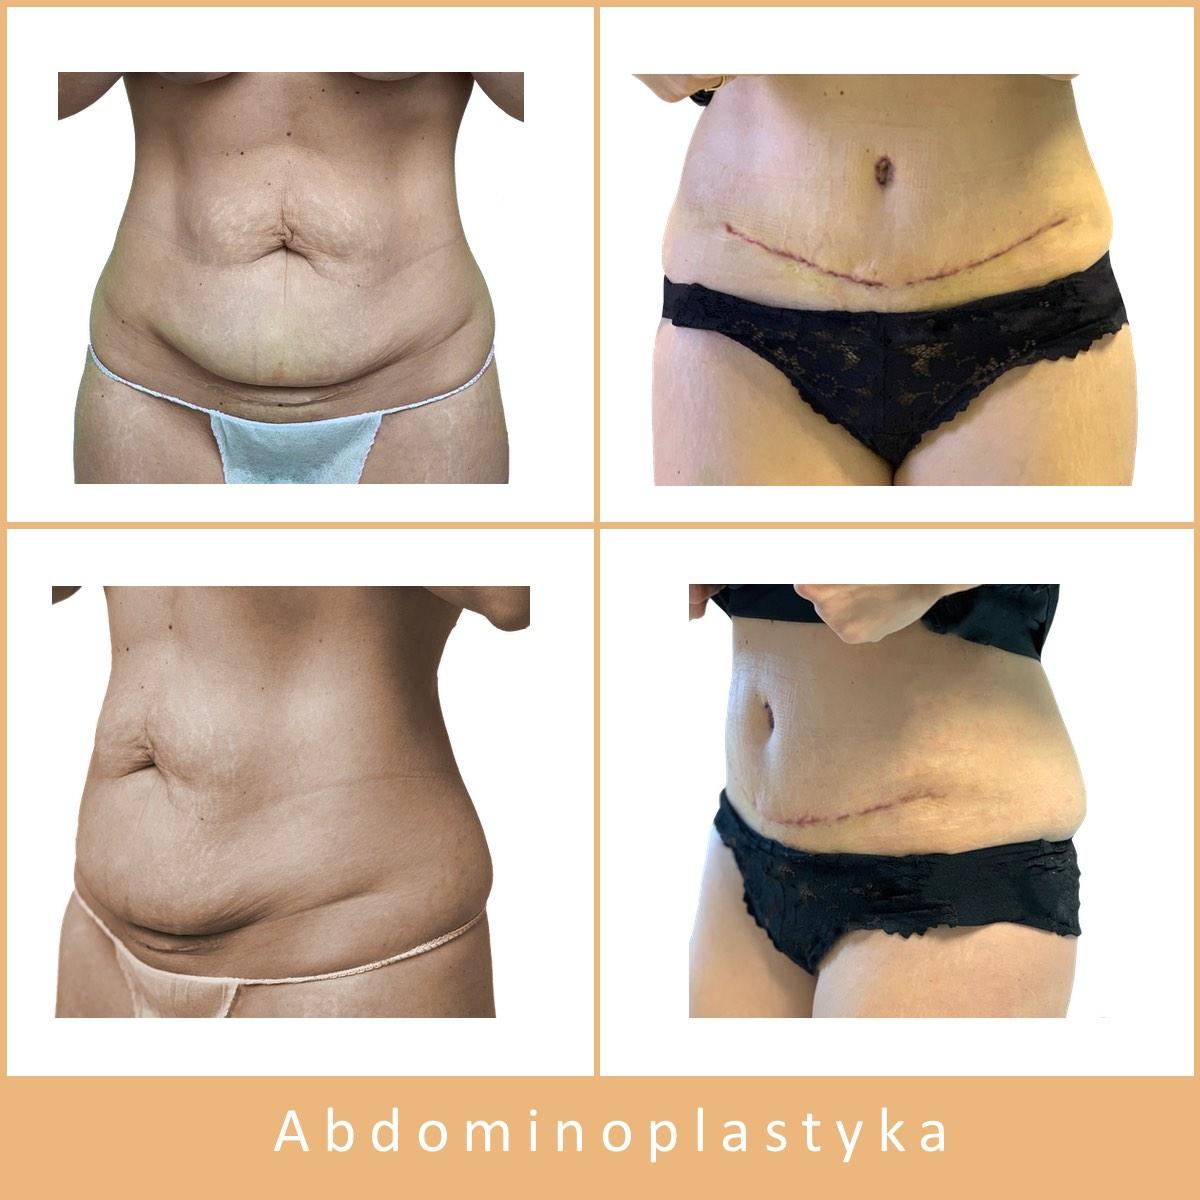 01 abdominoplastyka JPG